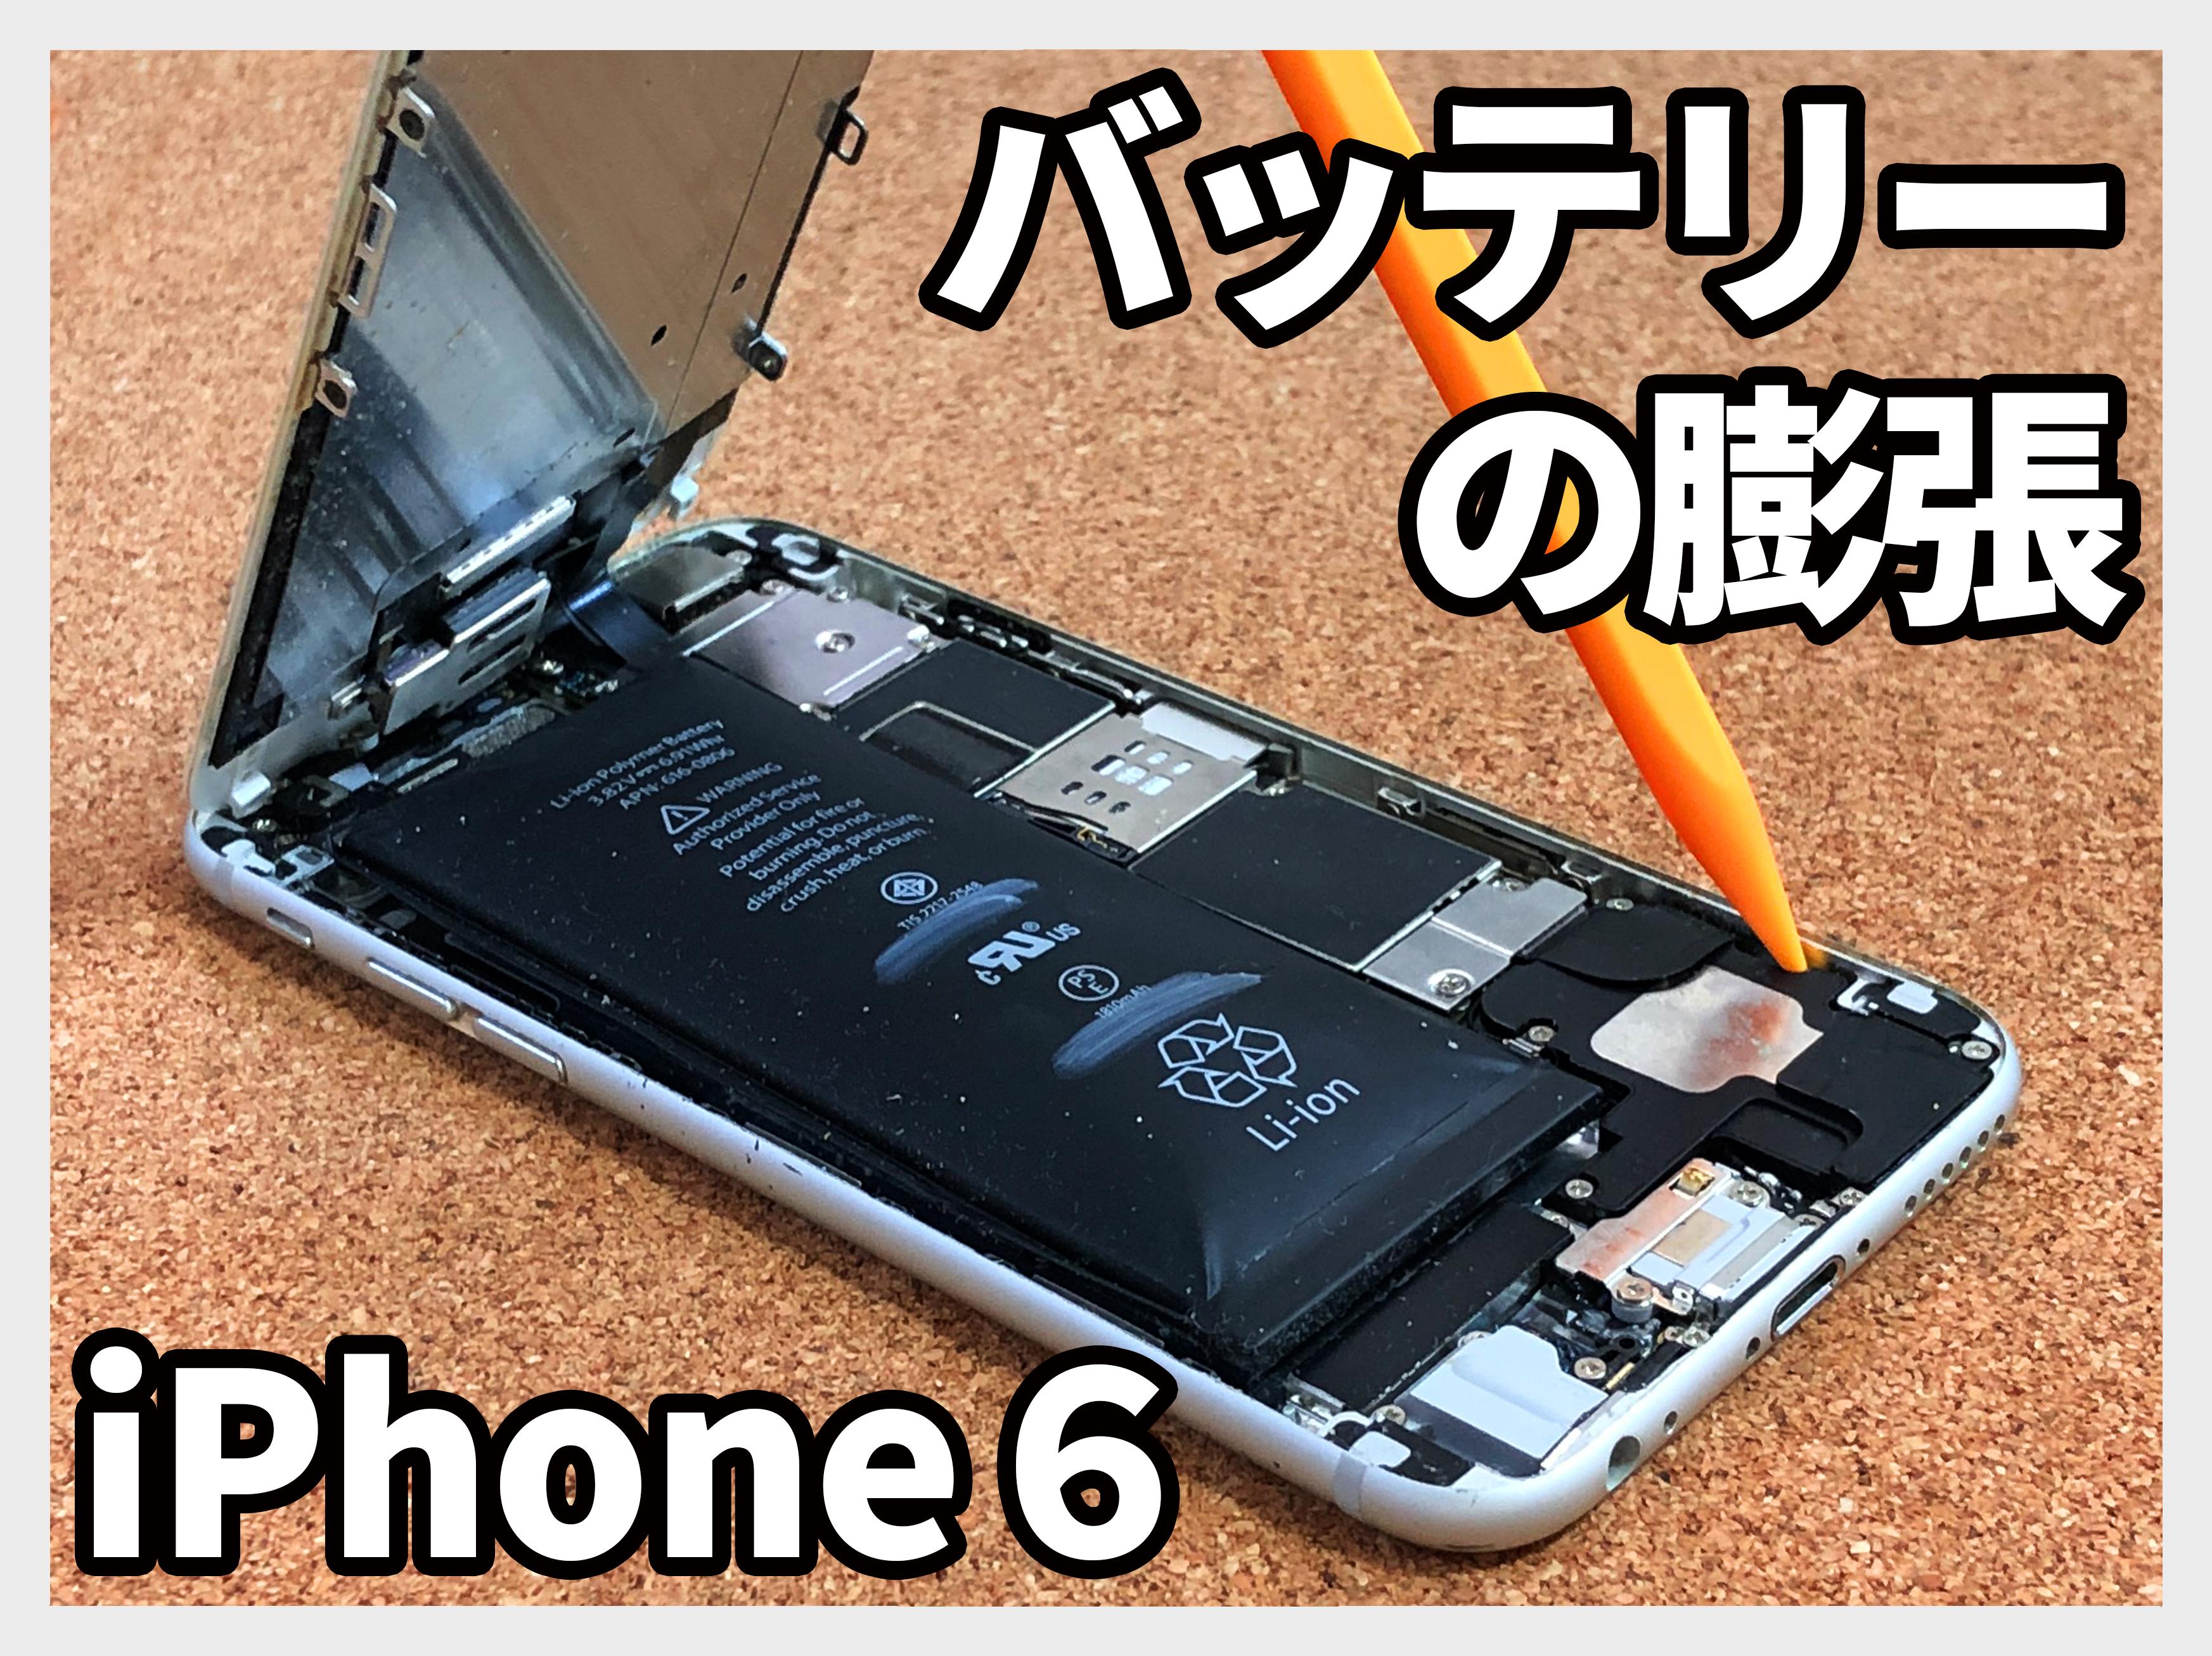 【iPhone6 バッテリー膨張 山梨県 甲府市】iphone6 バッテリー交換 電池甲府市よりお越しのお客様です